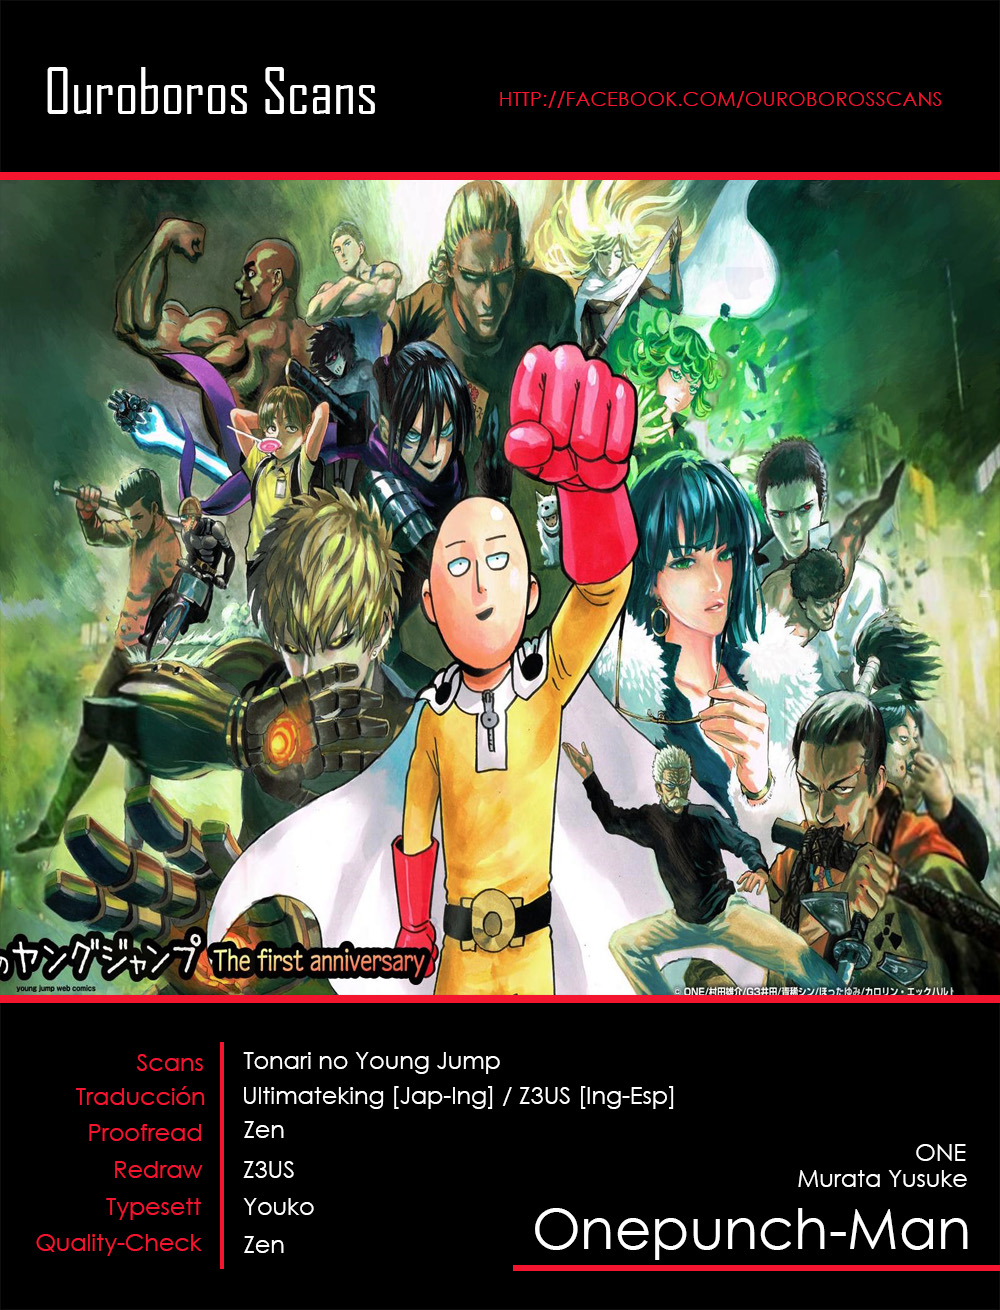 https://c5.ninemanga.com/es_manga/21/14805/415436/90fa66e108be8d979422d063c3234ebf.jpg Page 1